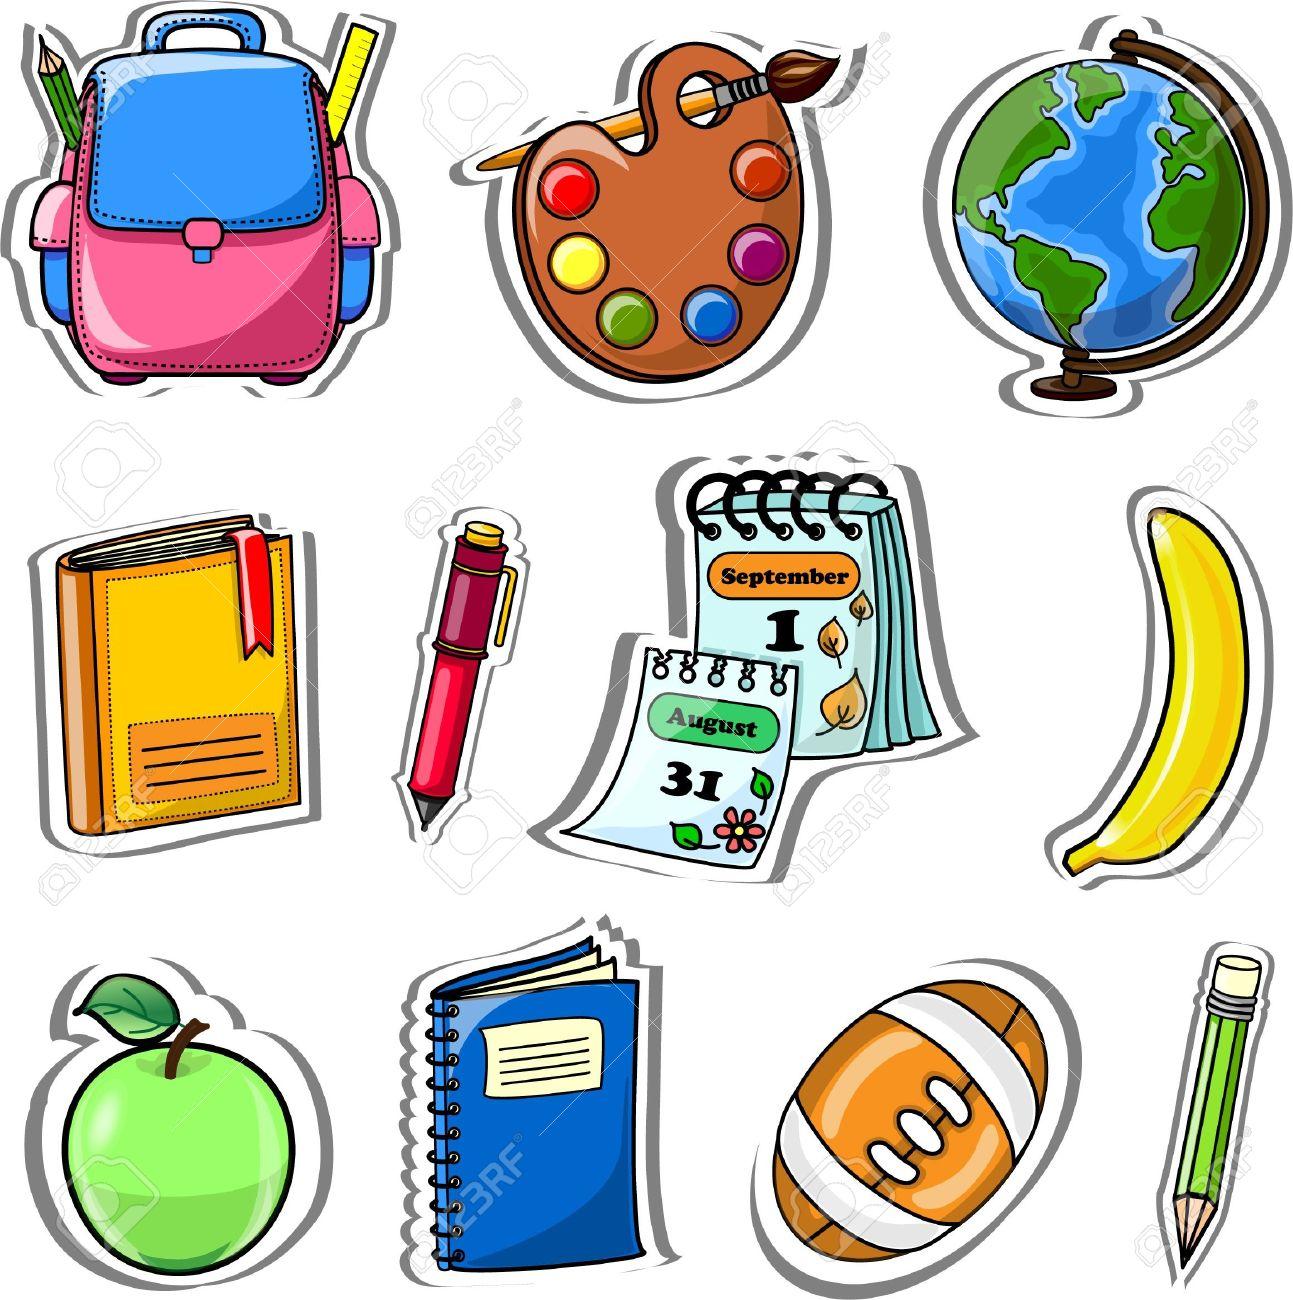 Cartoon school bag, pencil, book, notebook Stock Vector - 13410300